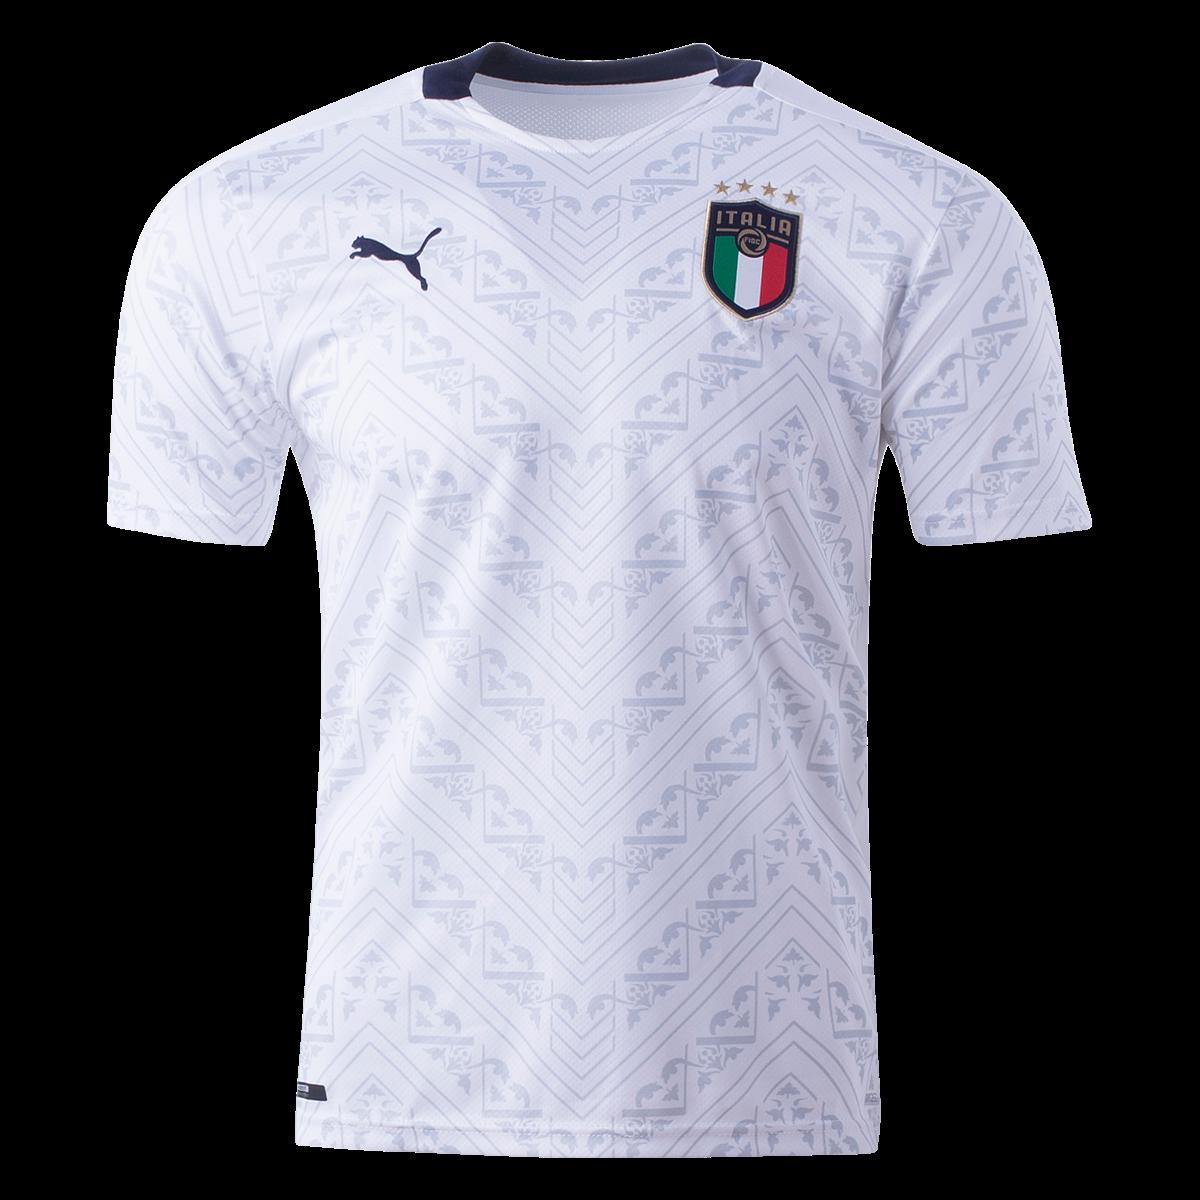 Puma Italy Away Jersey 2020 S In 2020 Jersey Shirt World Soccer Shop Shirts